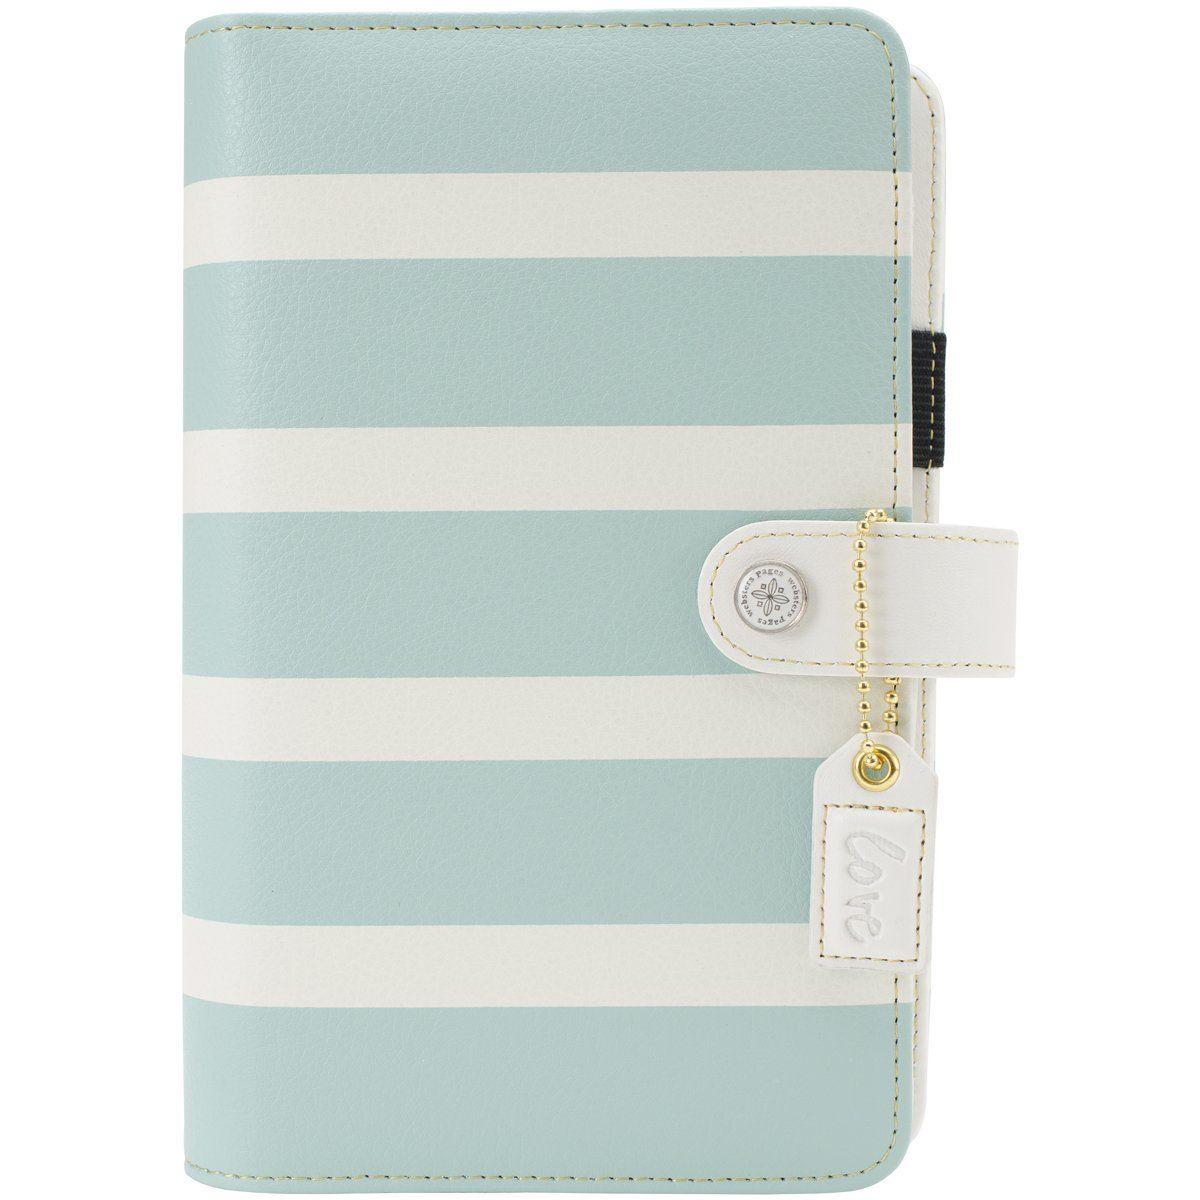 Color Crush Personal Planner Kit-Teal & White Stripe: Amazon.de: Küche & Haushalt